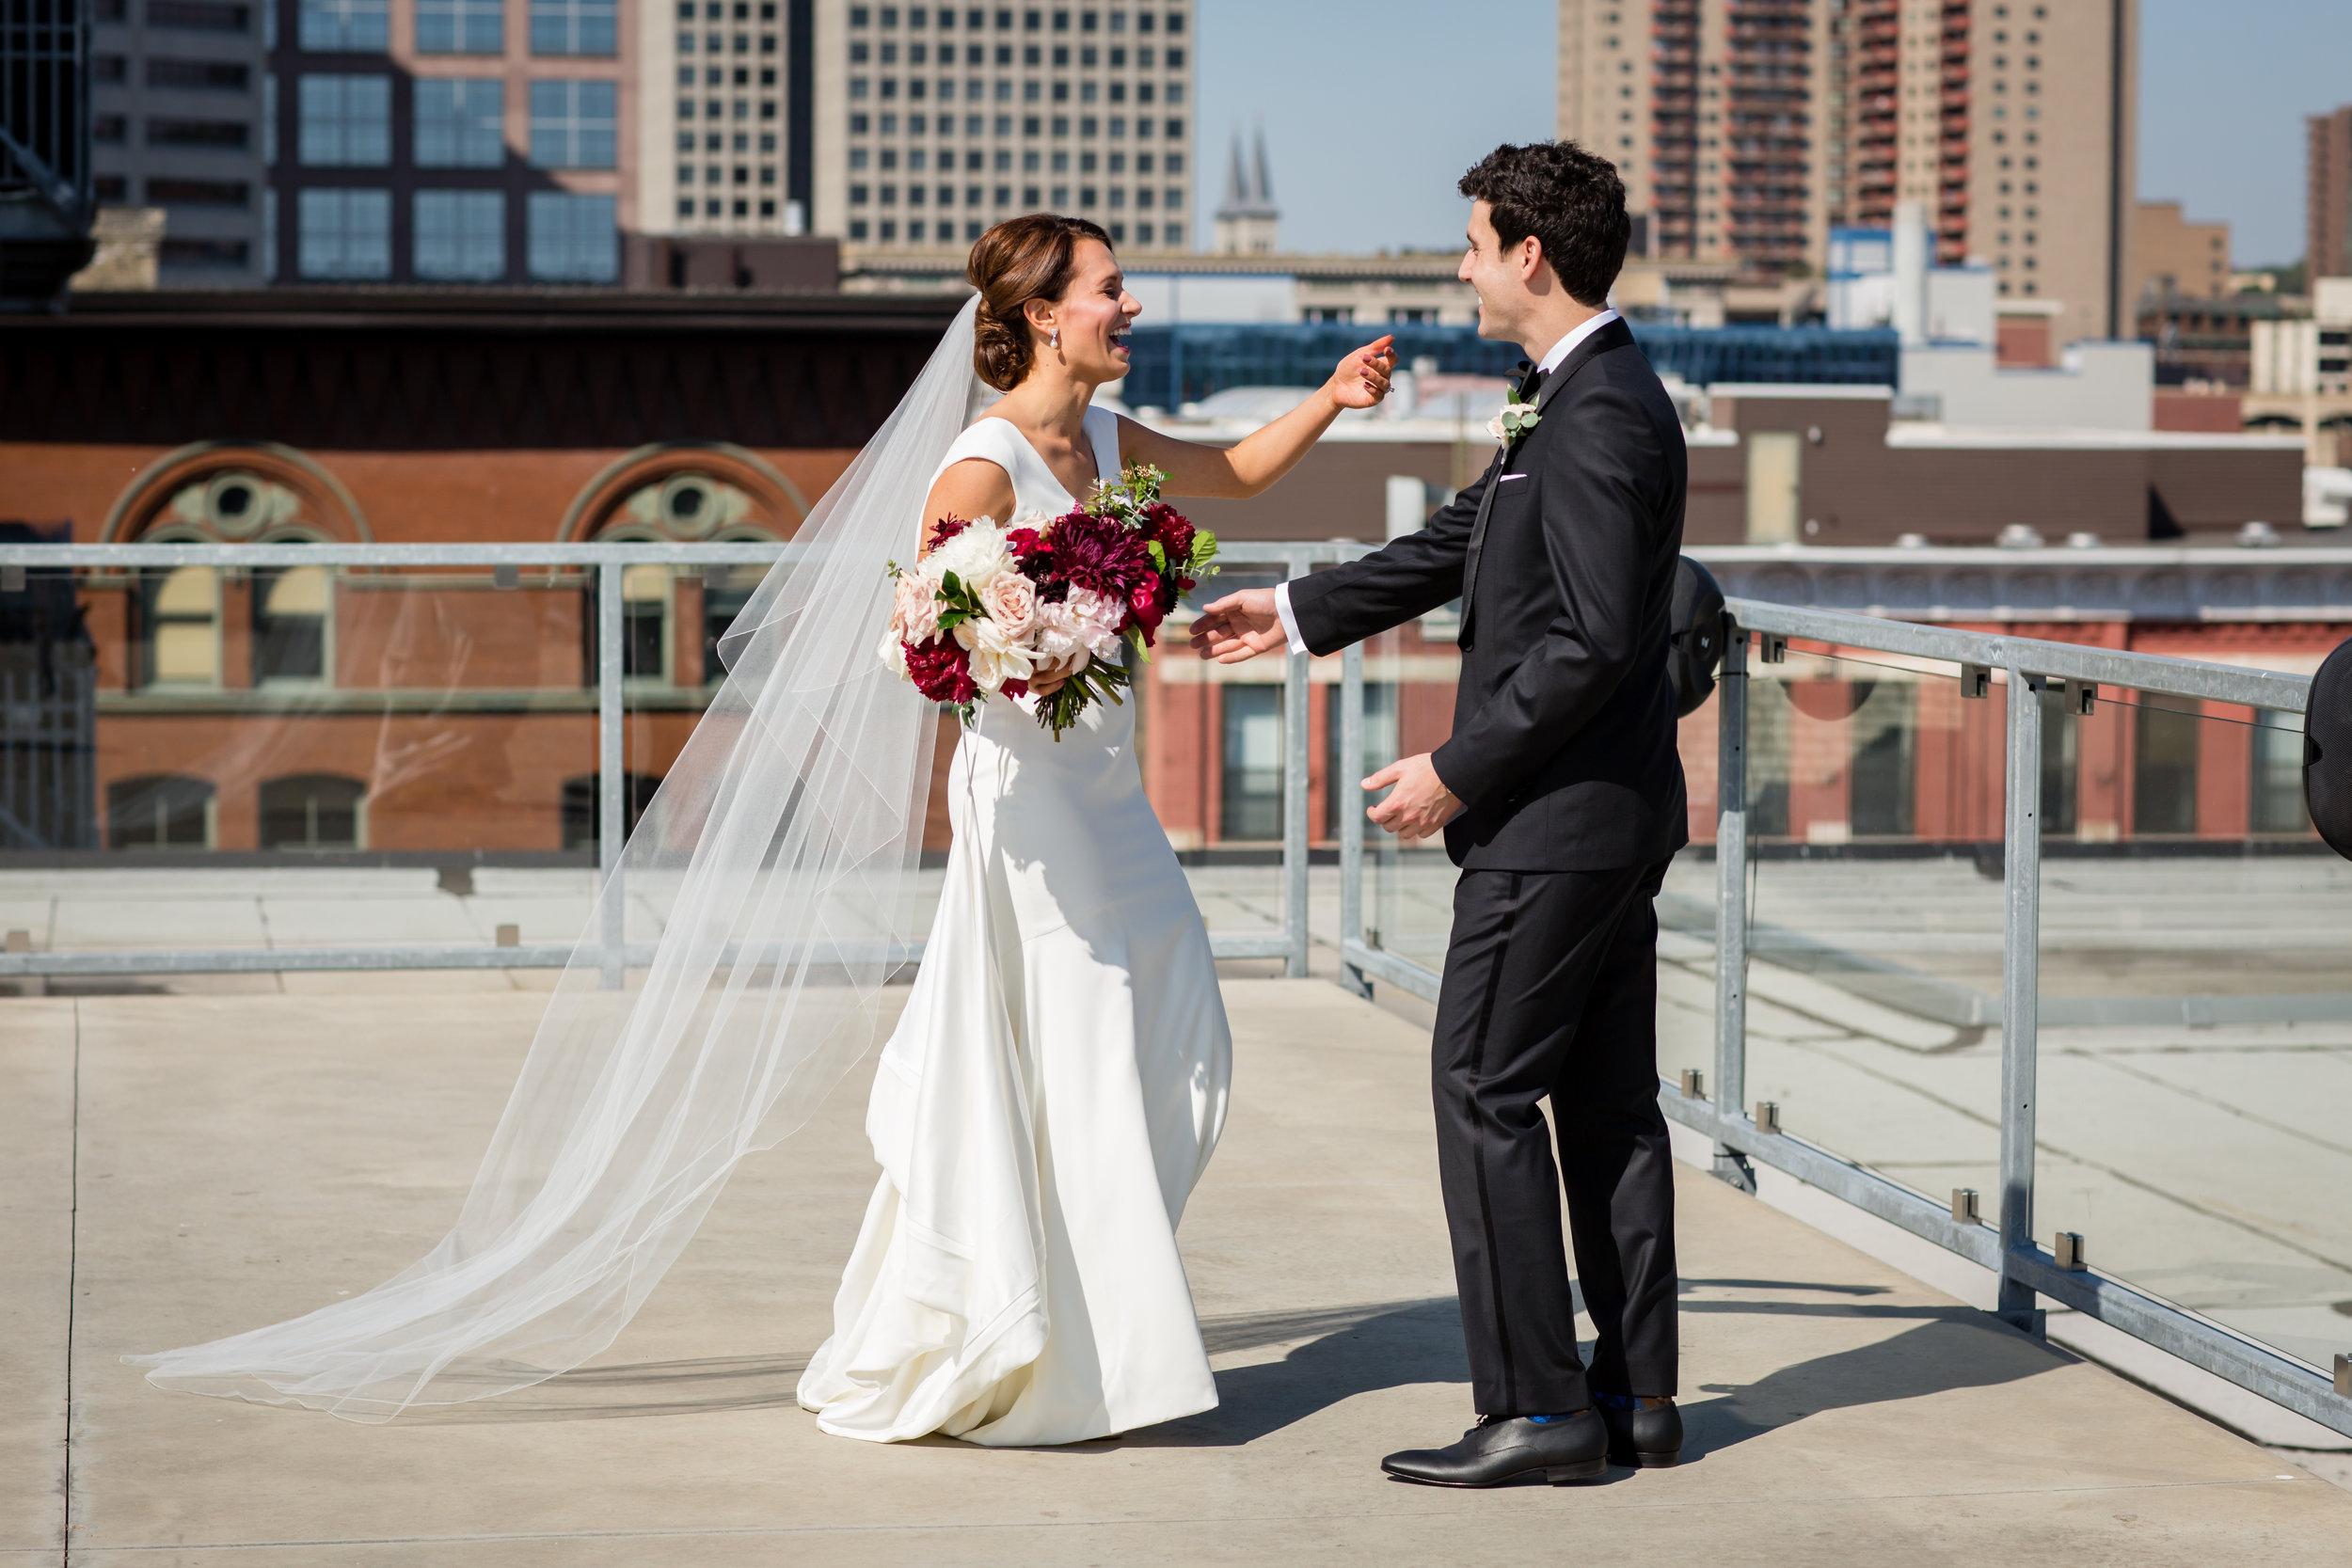 Aversa Wedding 6.10.17-038.JPG